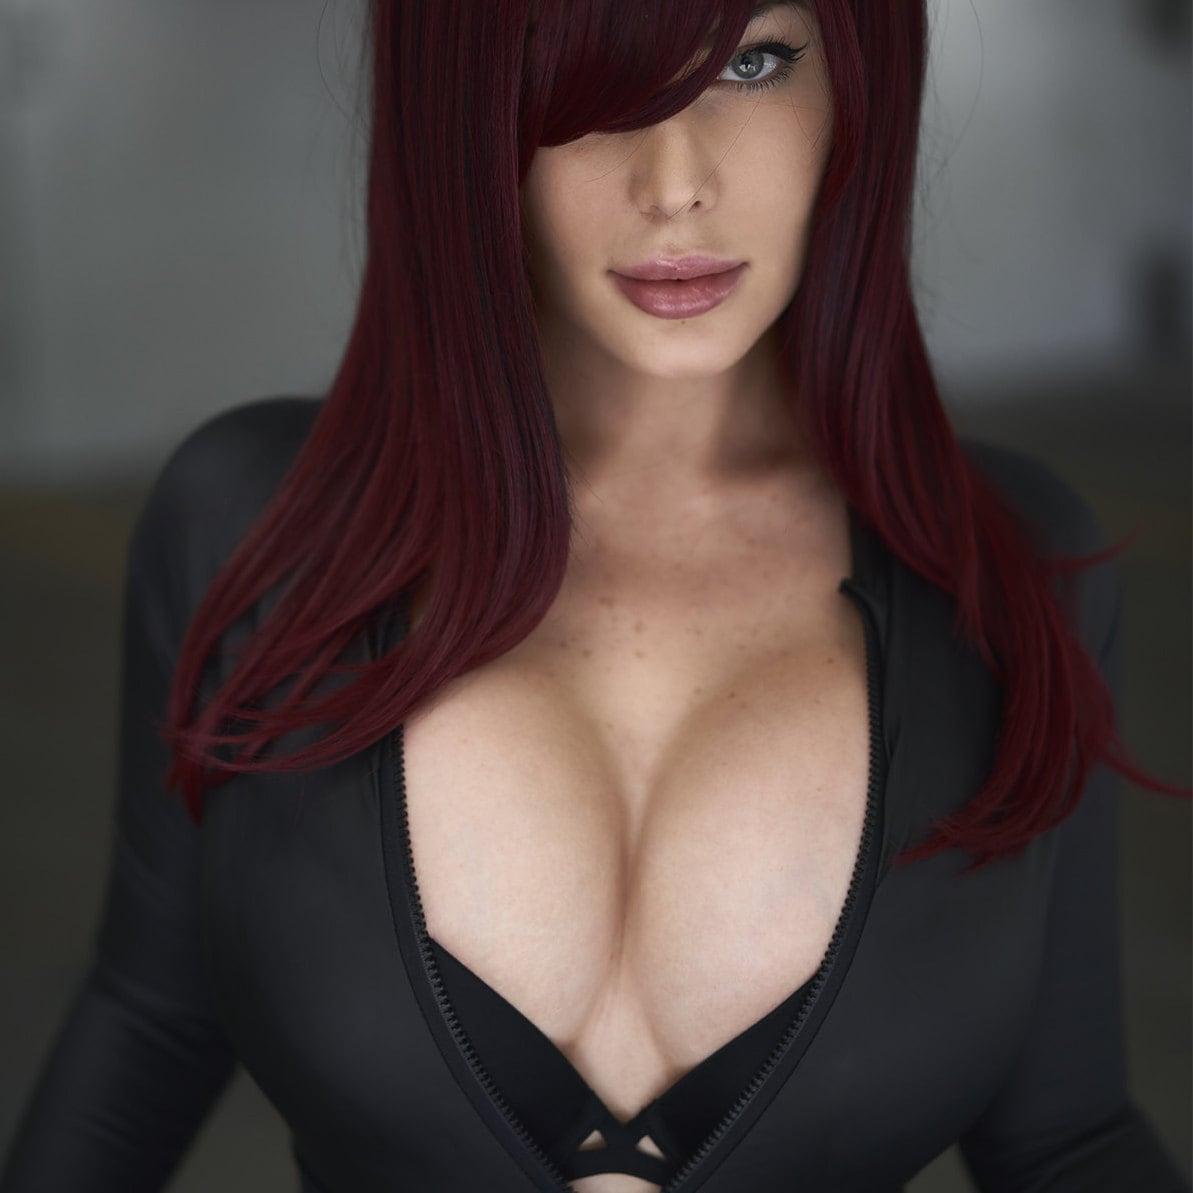 Veronika Black nudes (73 foto), pics Selfie, Instagram, butt 2016